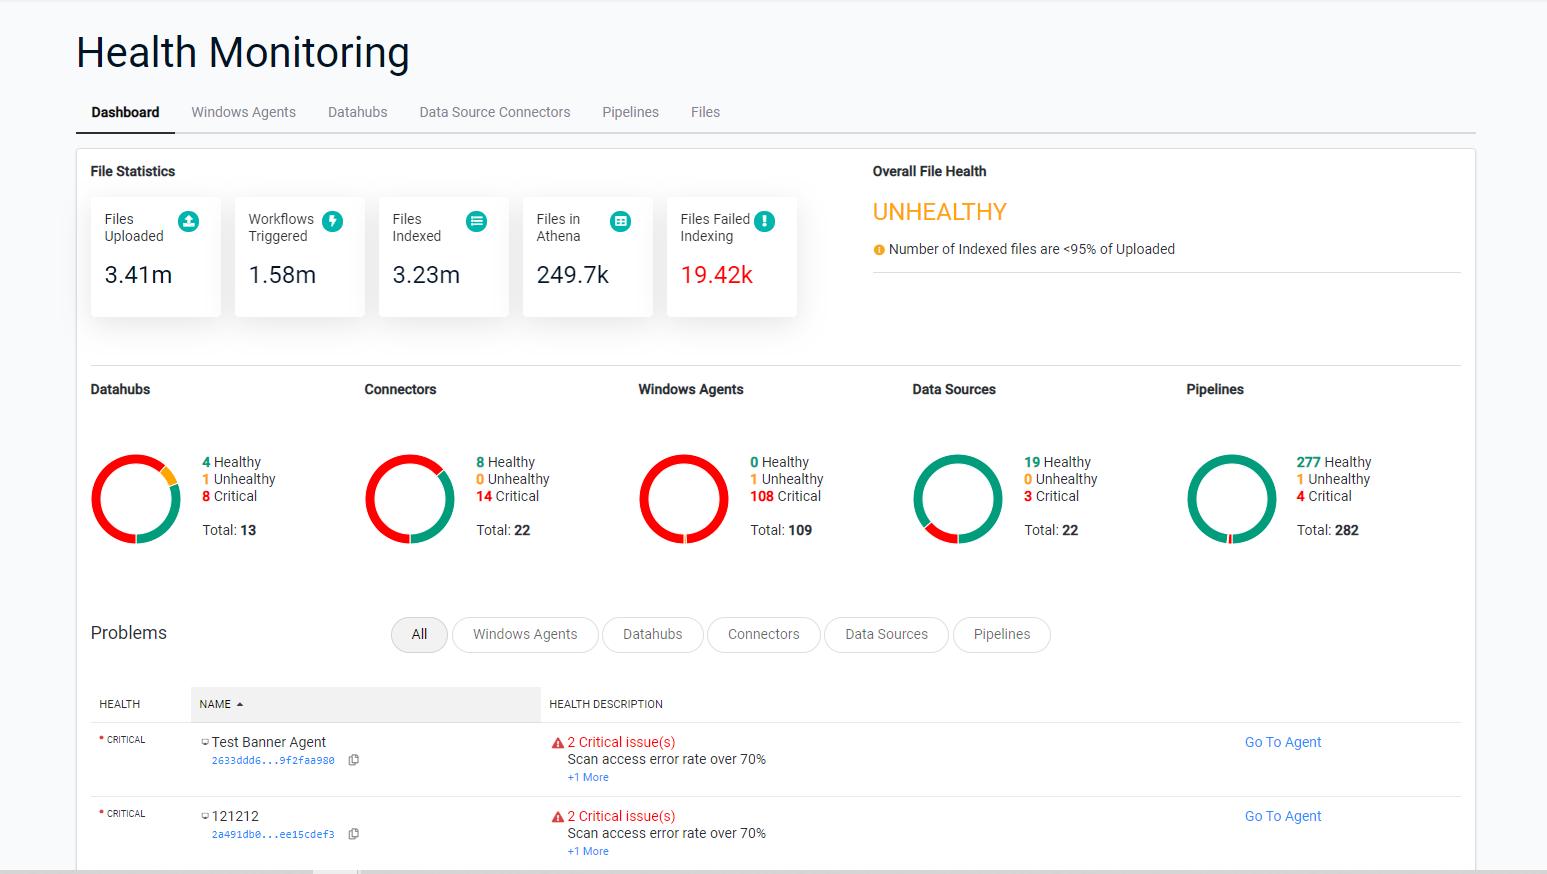 Health Monitoring Dashboard